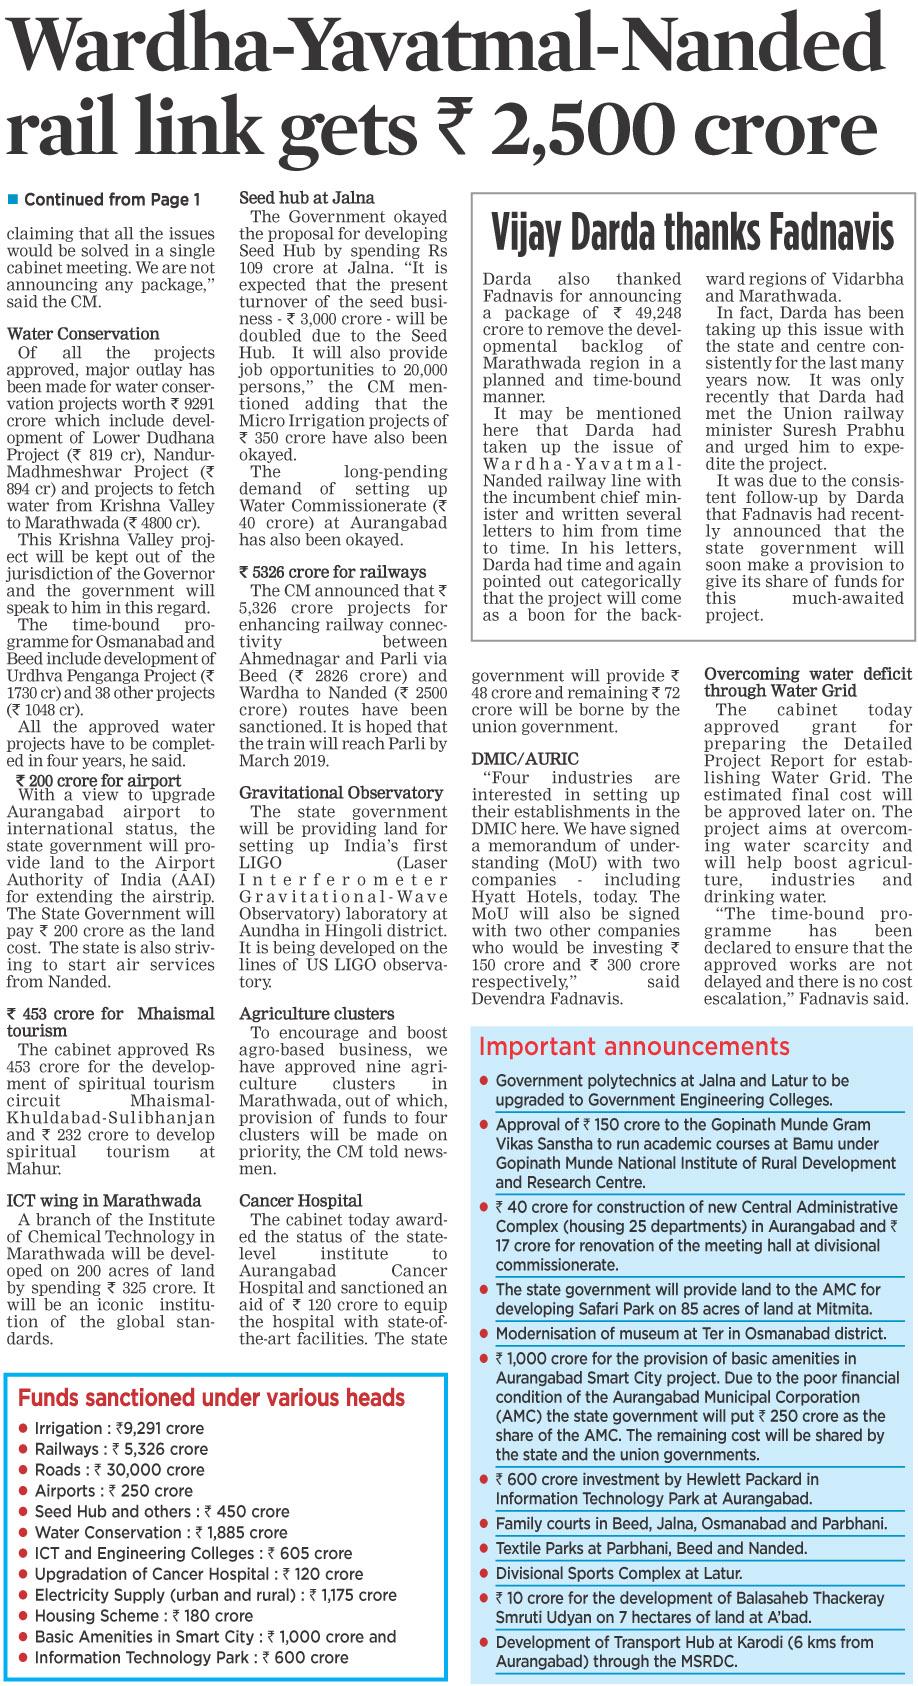 Wardha-Yavatmal-Nanded rail link gets Rs 2,500 crore